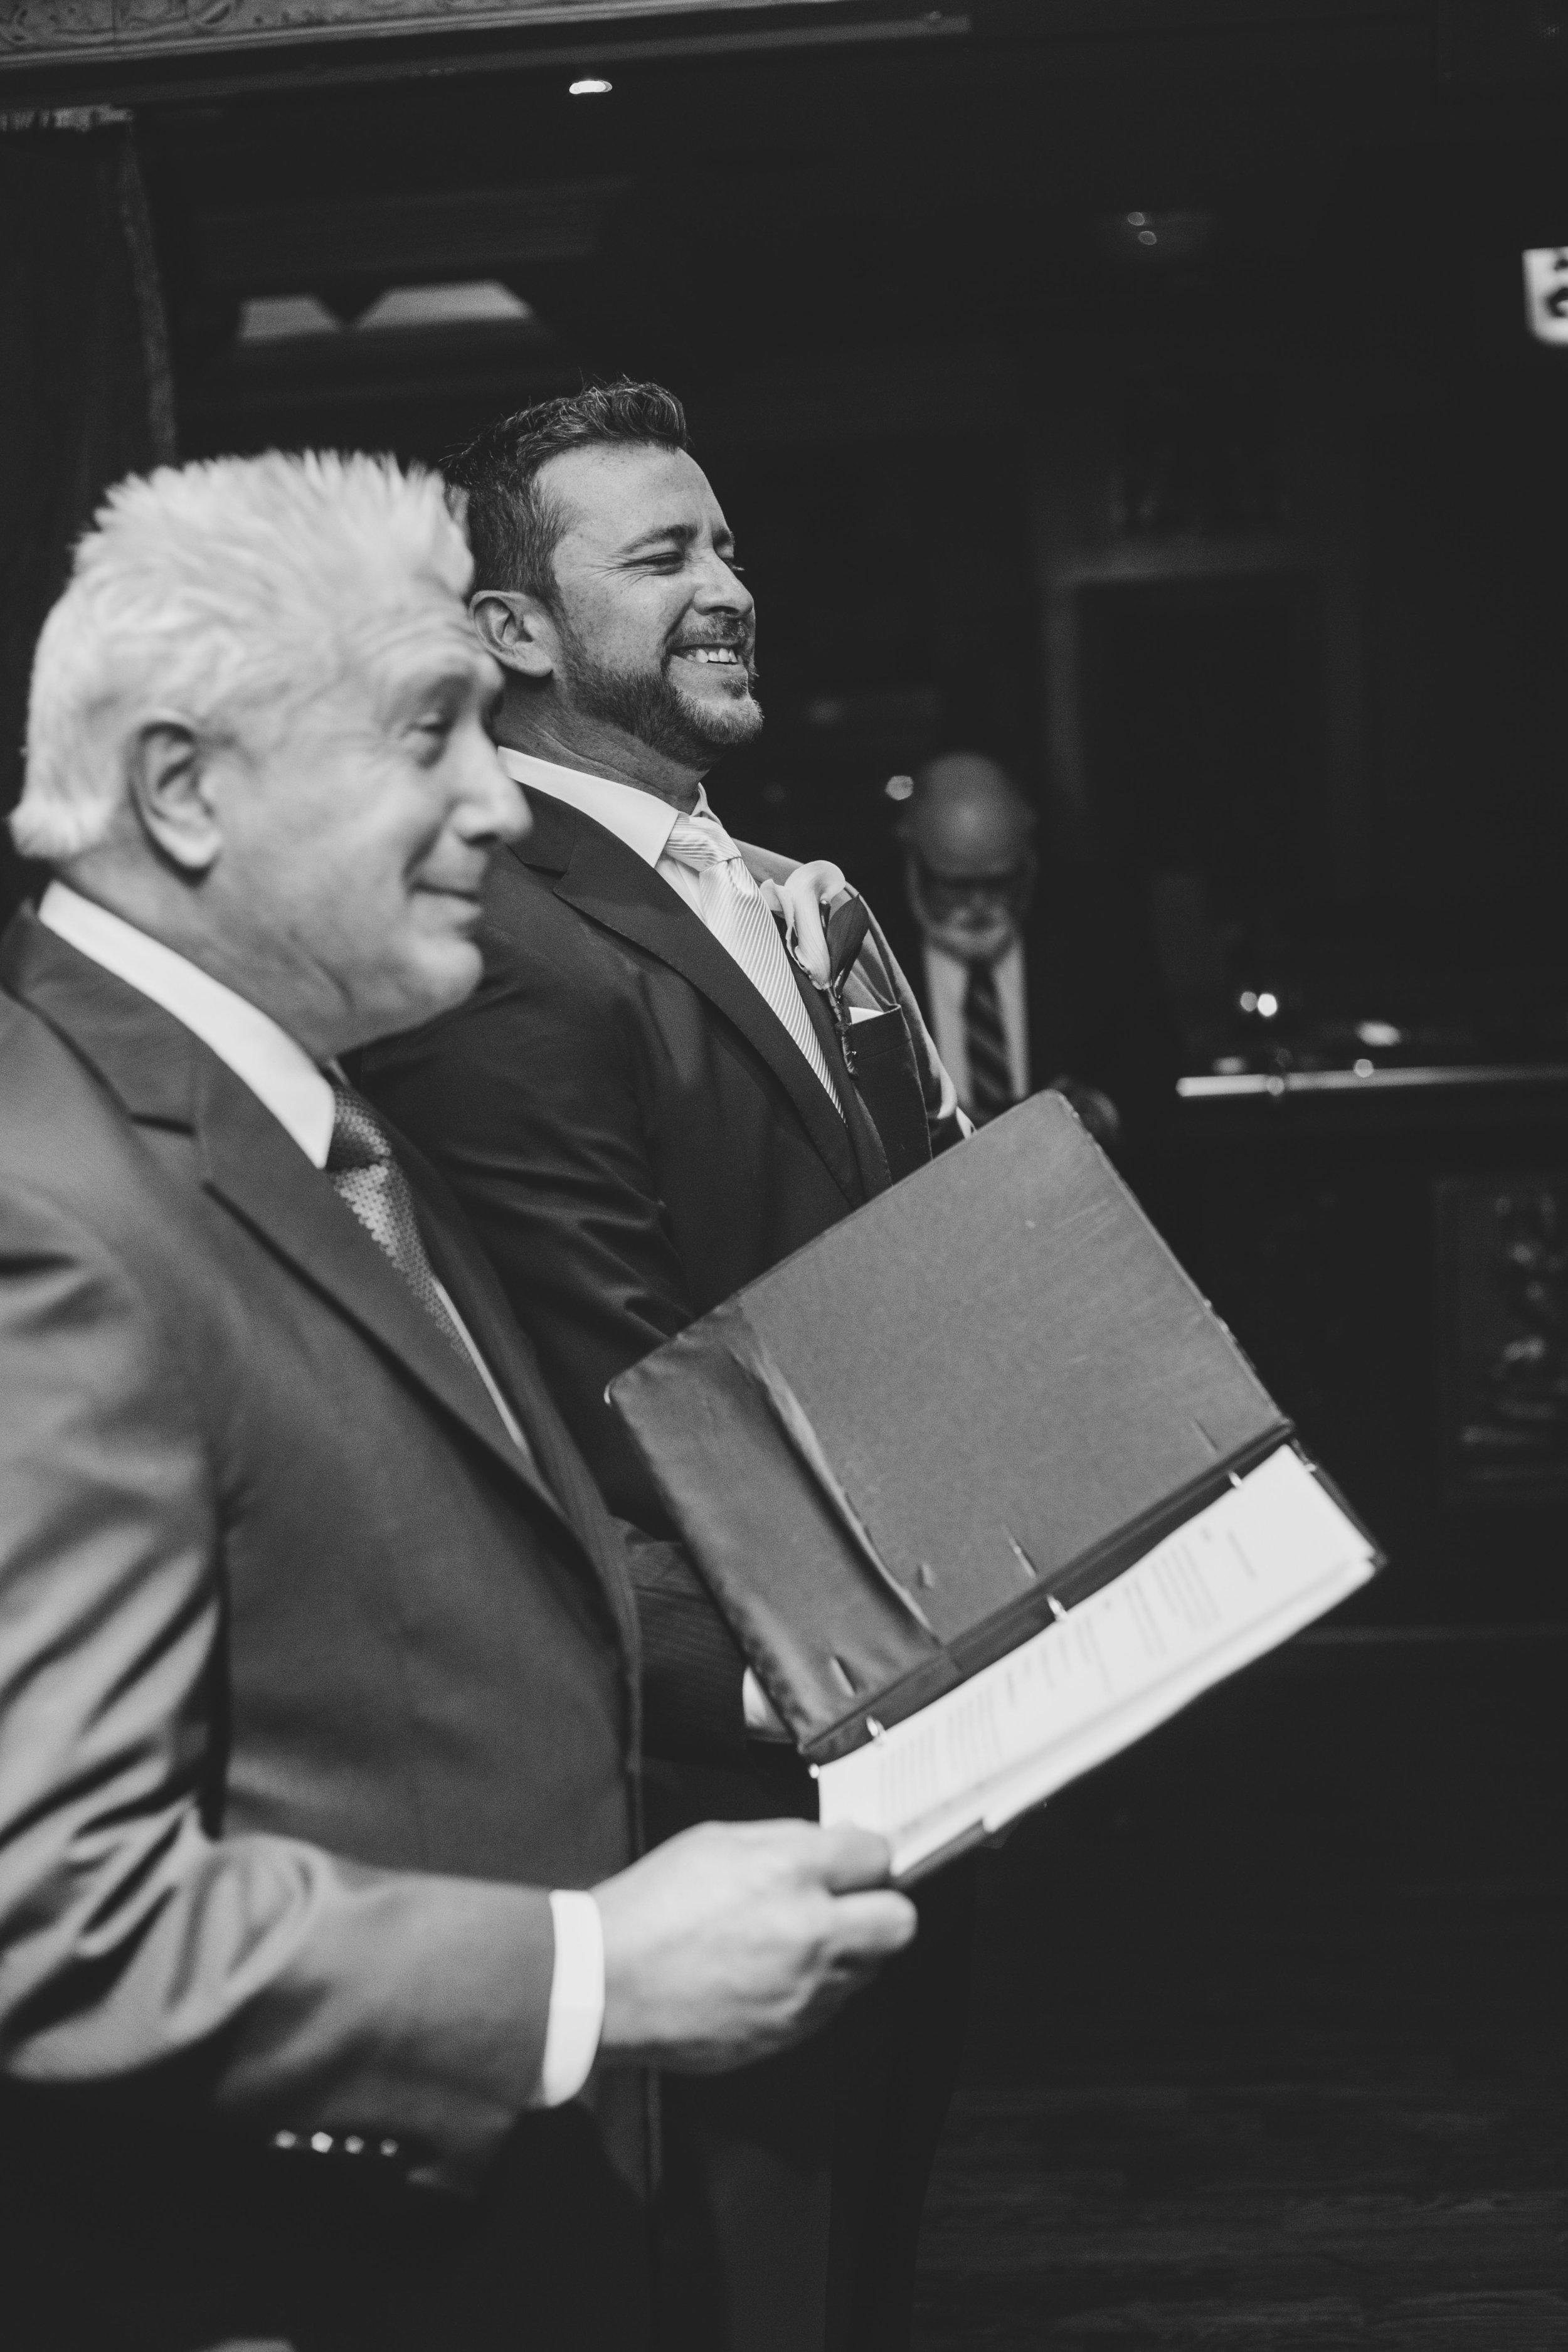 ATGI_Kat and Gabe Wedding 2016_2S8A5297.jpg